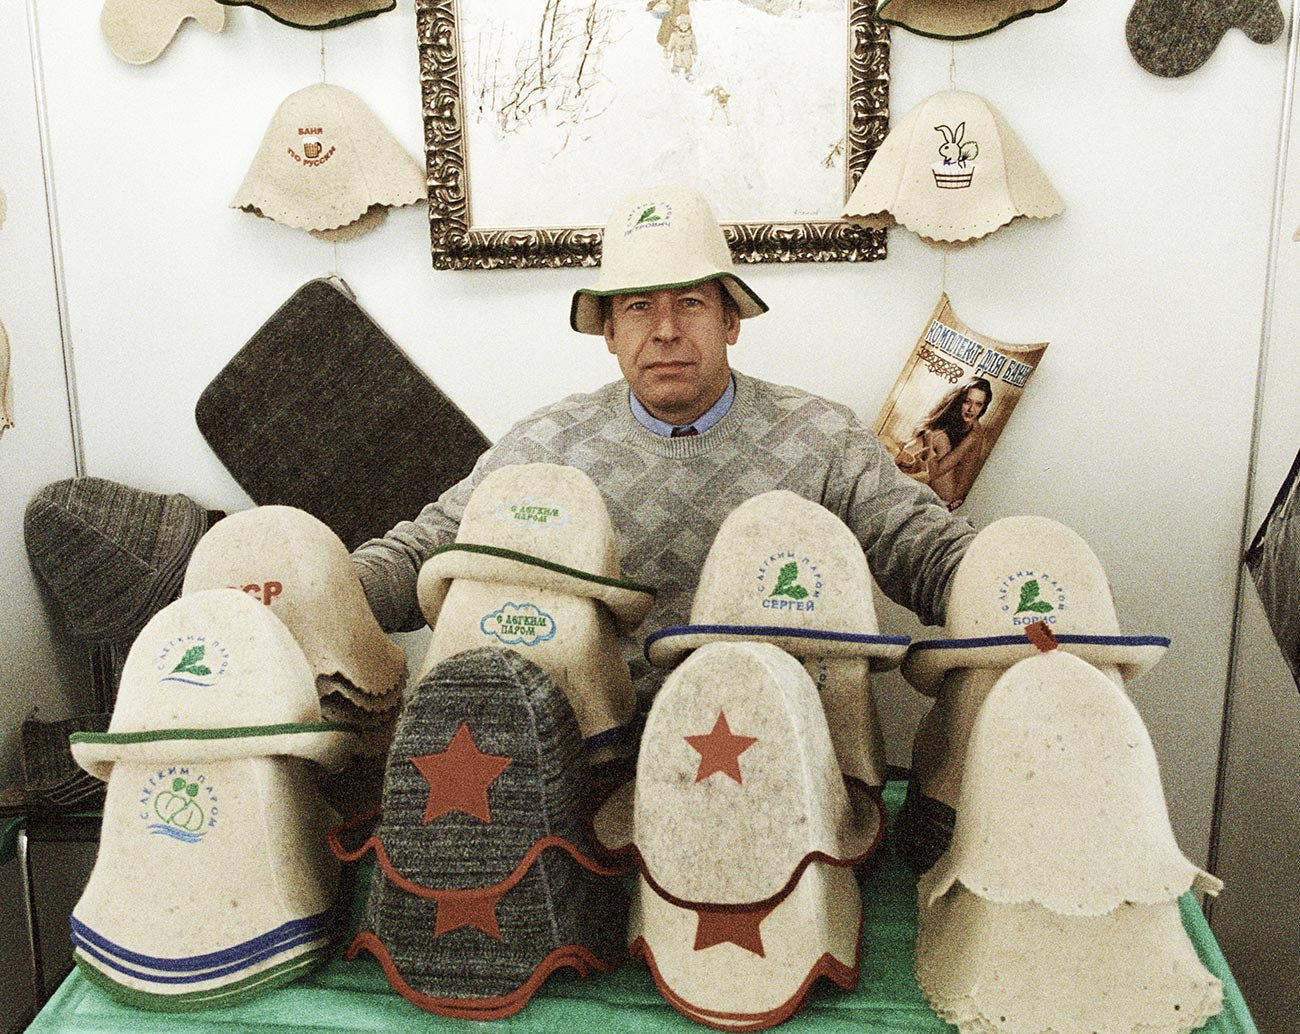 Prodavač kapa na izložbi